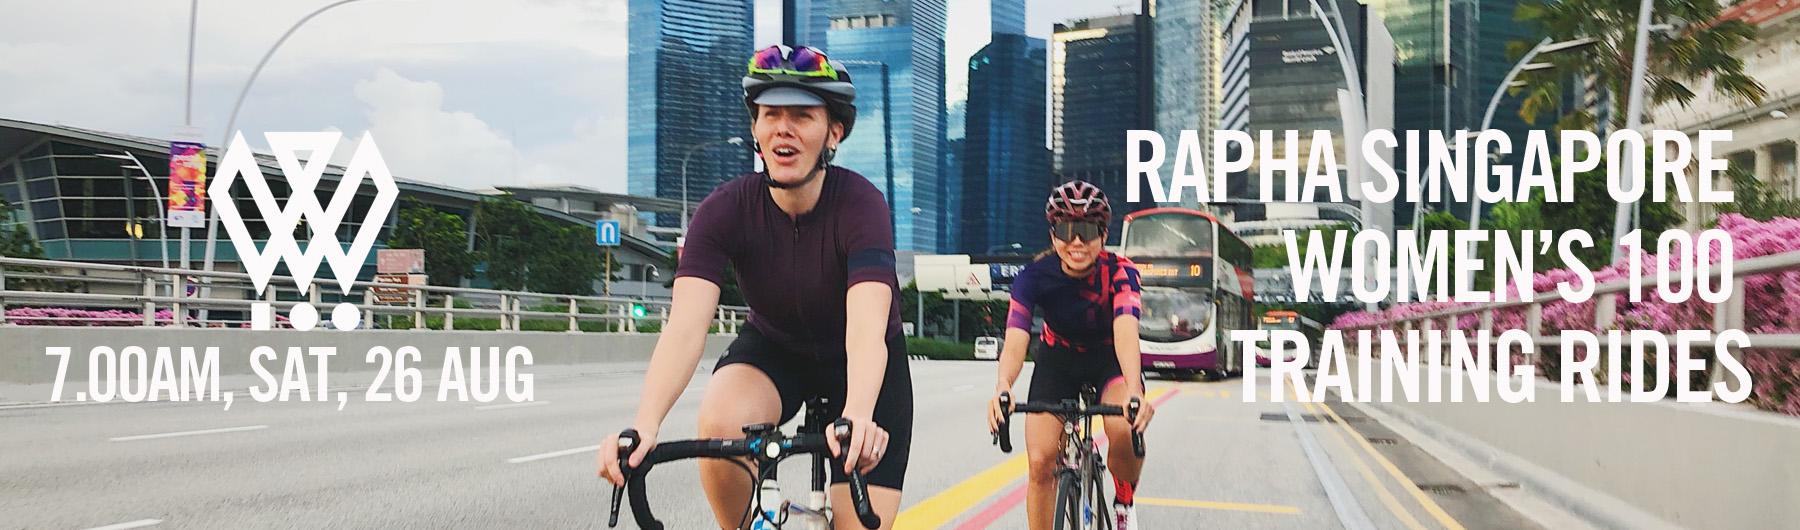 Rapha Singapore Women's 100 Training - Sunday Ride | 7.00am, 26 Aug 2018 | Macritchie Reservoir Drop Off